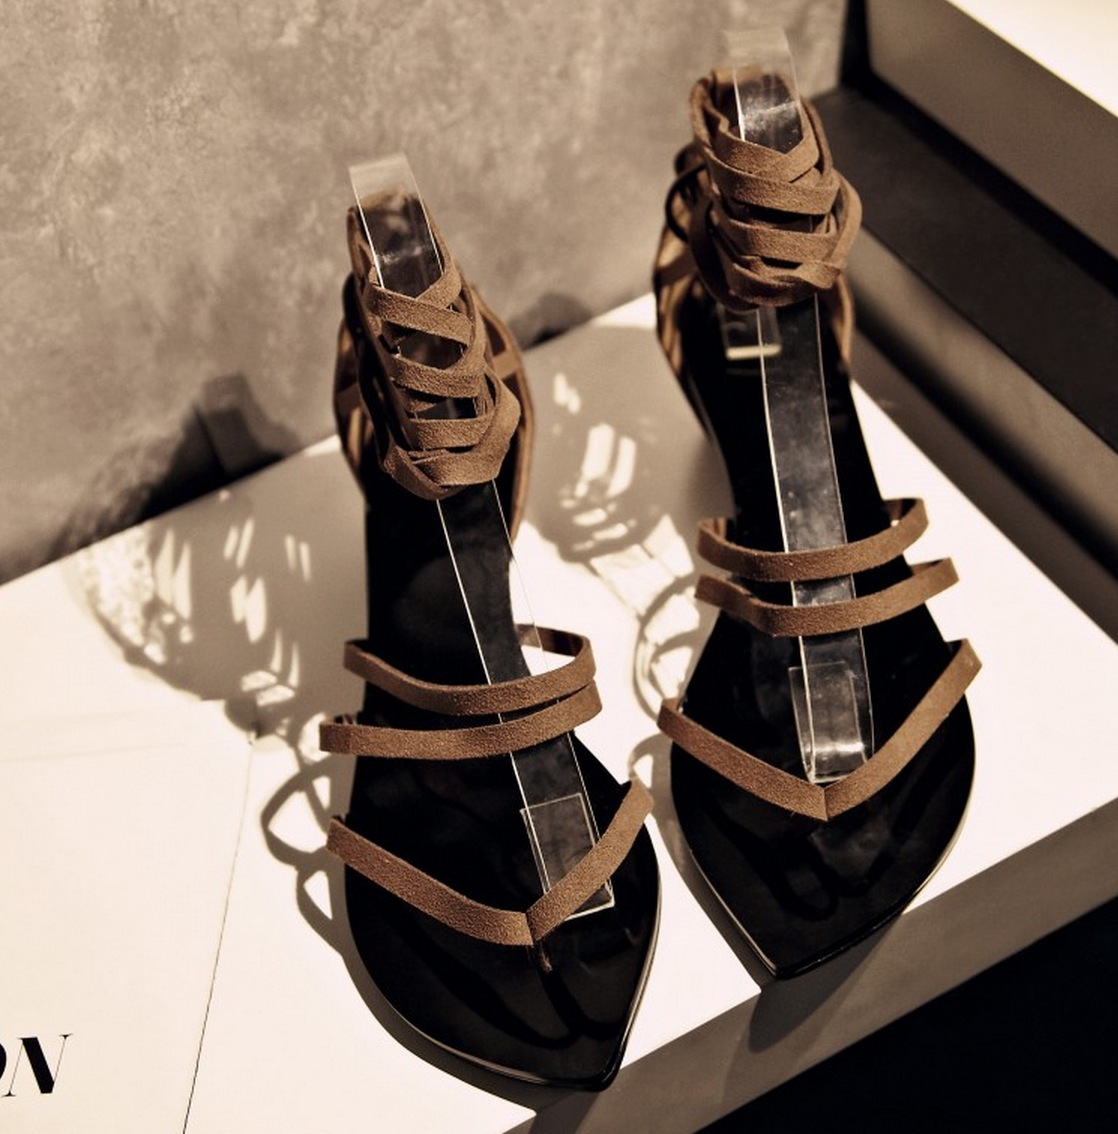 Shoes Summer Women Sandals 2015 Wedge sandals Genuine leather Fashion Flip-flop Straps Peep Gladiator Sandals Women